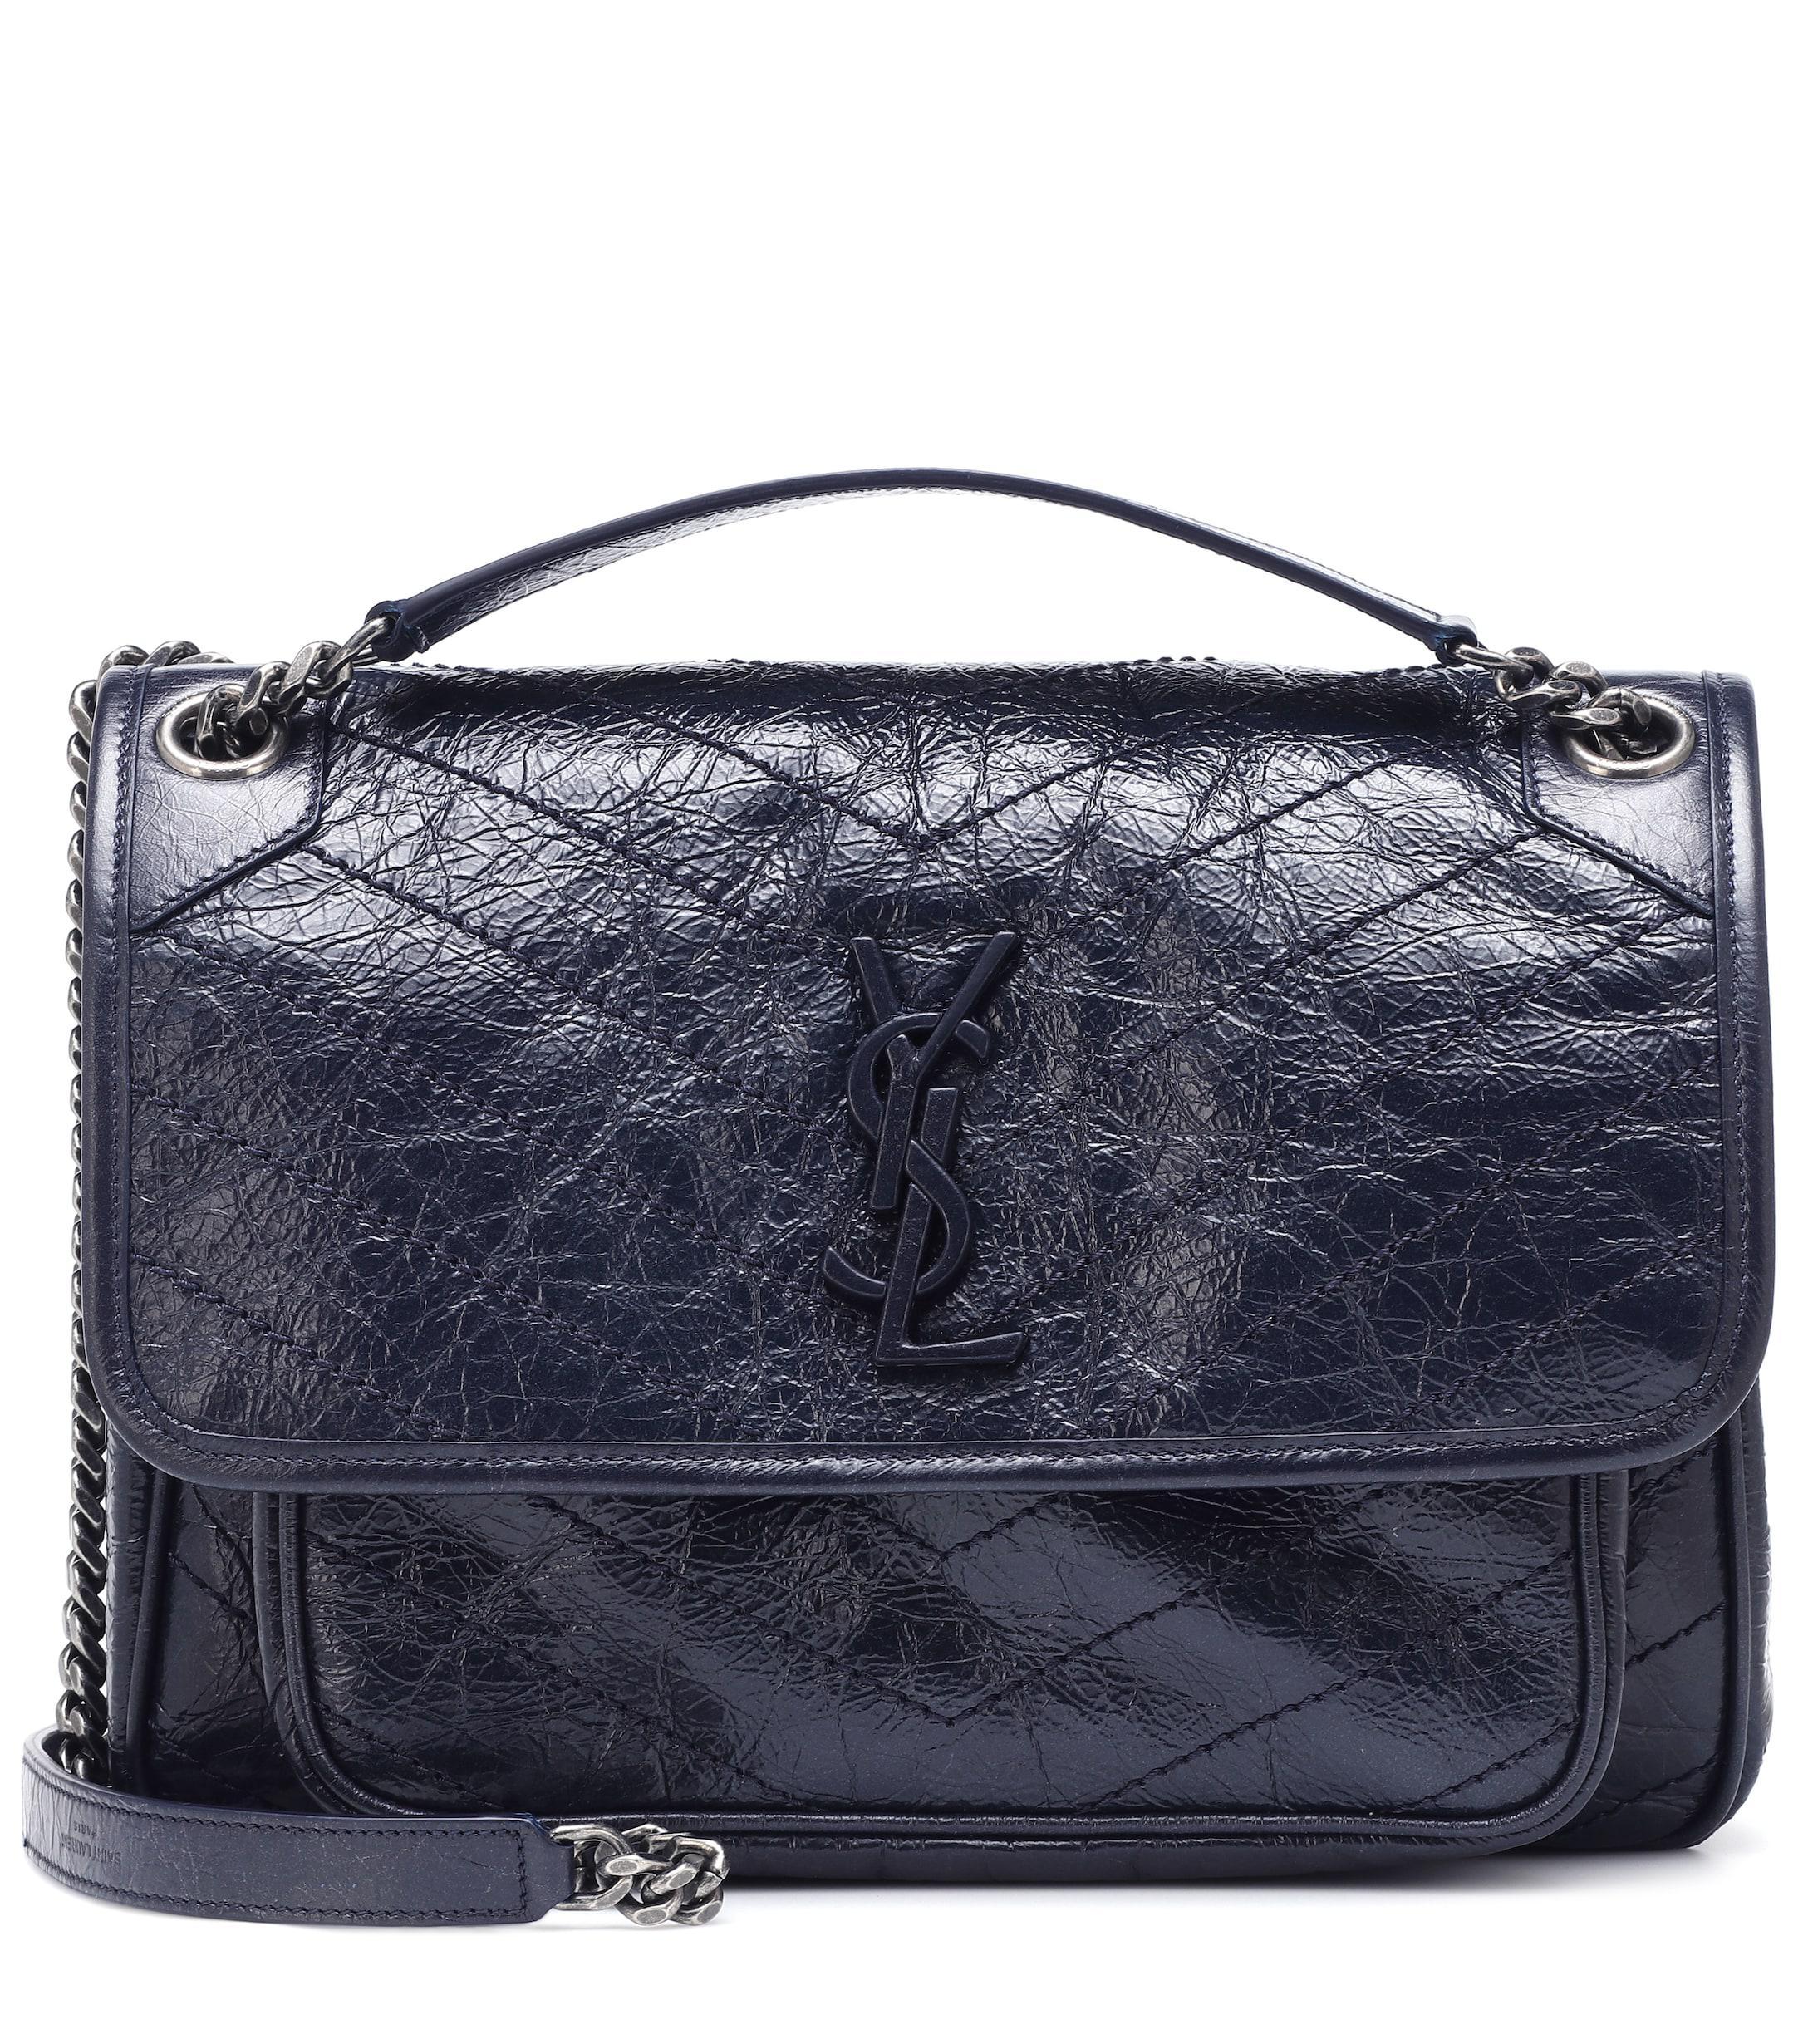 Lyst - Saint Laurent Medium Niki Leather Shoulder Bag in Blue e144fea44127b